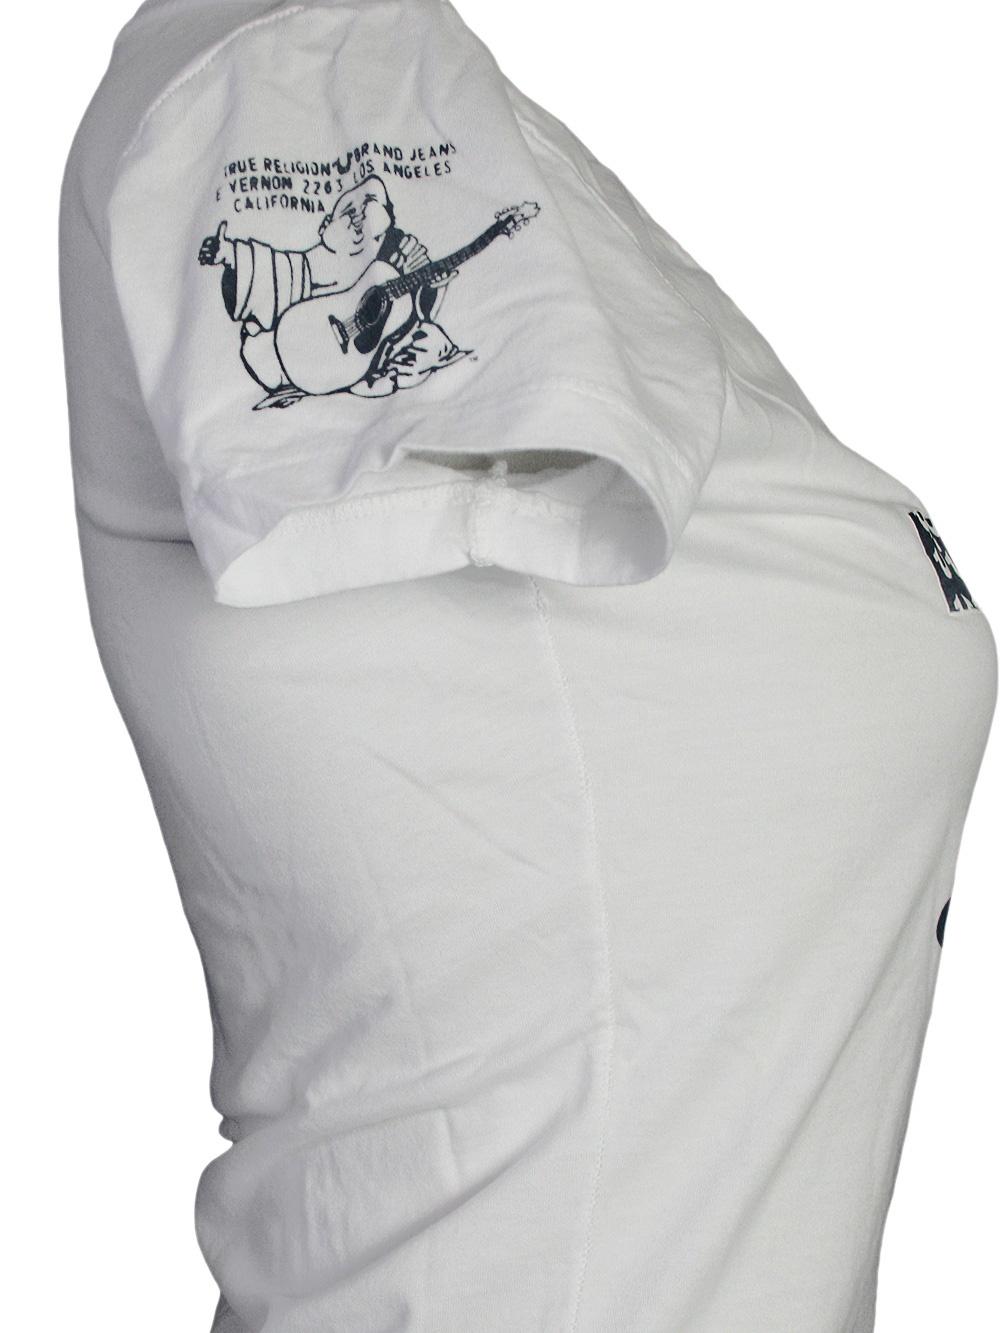 true religion damen v neck shirt true religion 6583 shirts g nstig online kaufen 79 99. Black Bedroom Furniture Sets. Home Design Ideas